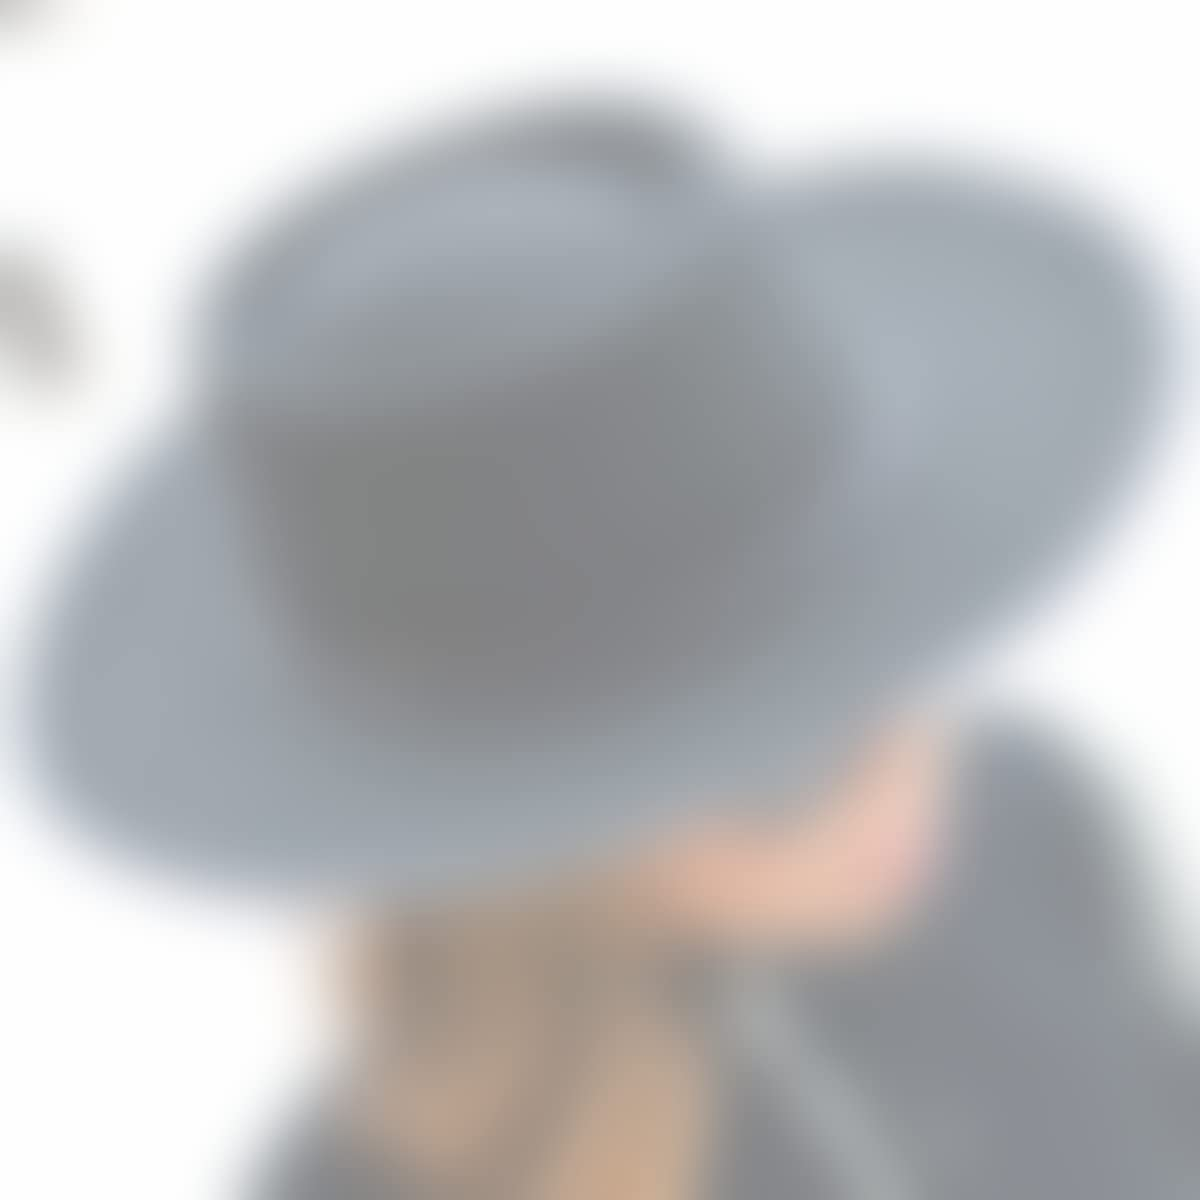 Amazon.com: RACEU ATELIER Black Billy Hat - Wide Brim Fedora Hat - 100% Wool Felt - Fedoras & Trilby Hats - Water Resistant - Unisex - Cowboy Hat: Handmade